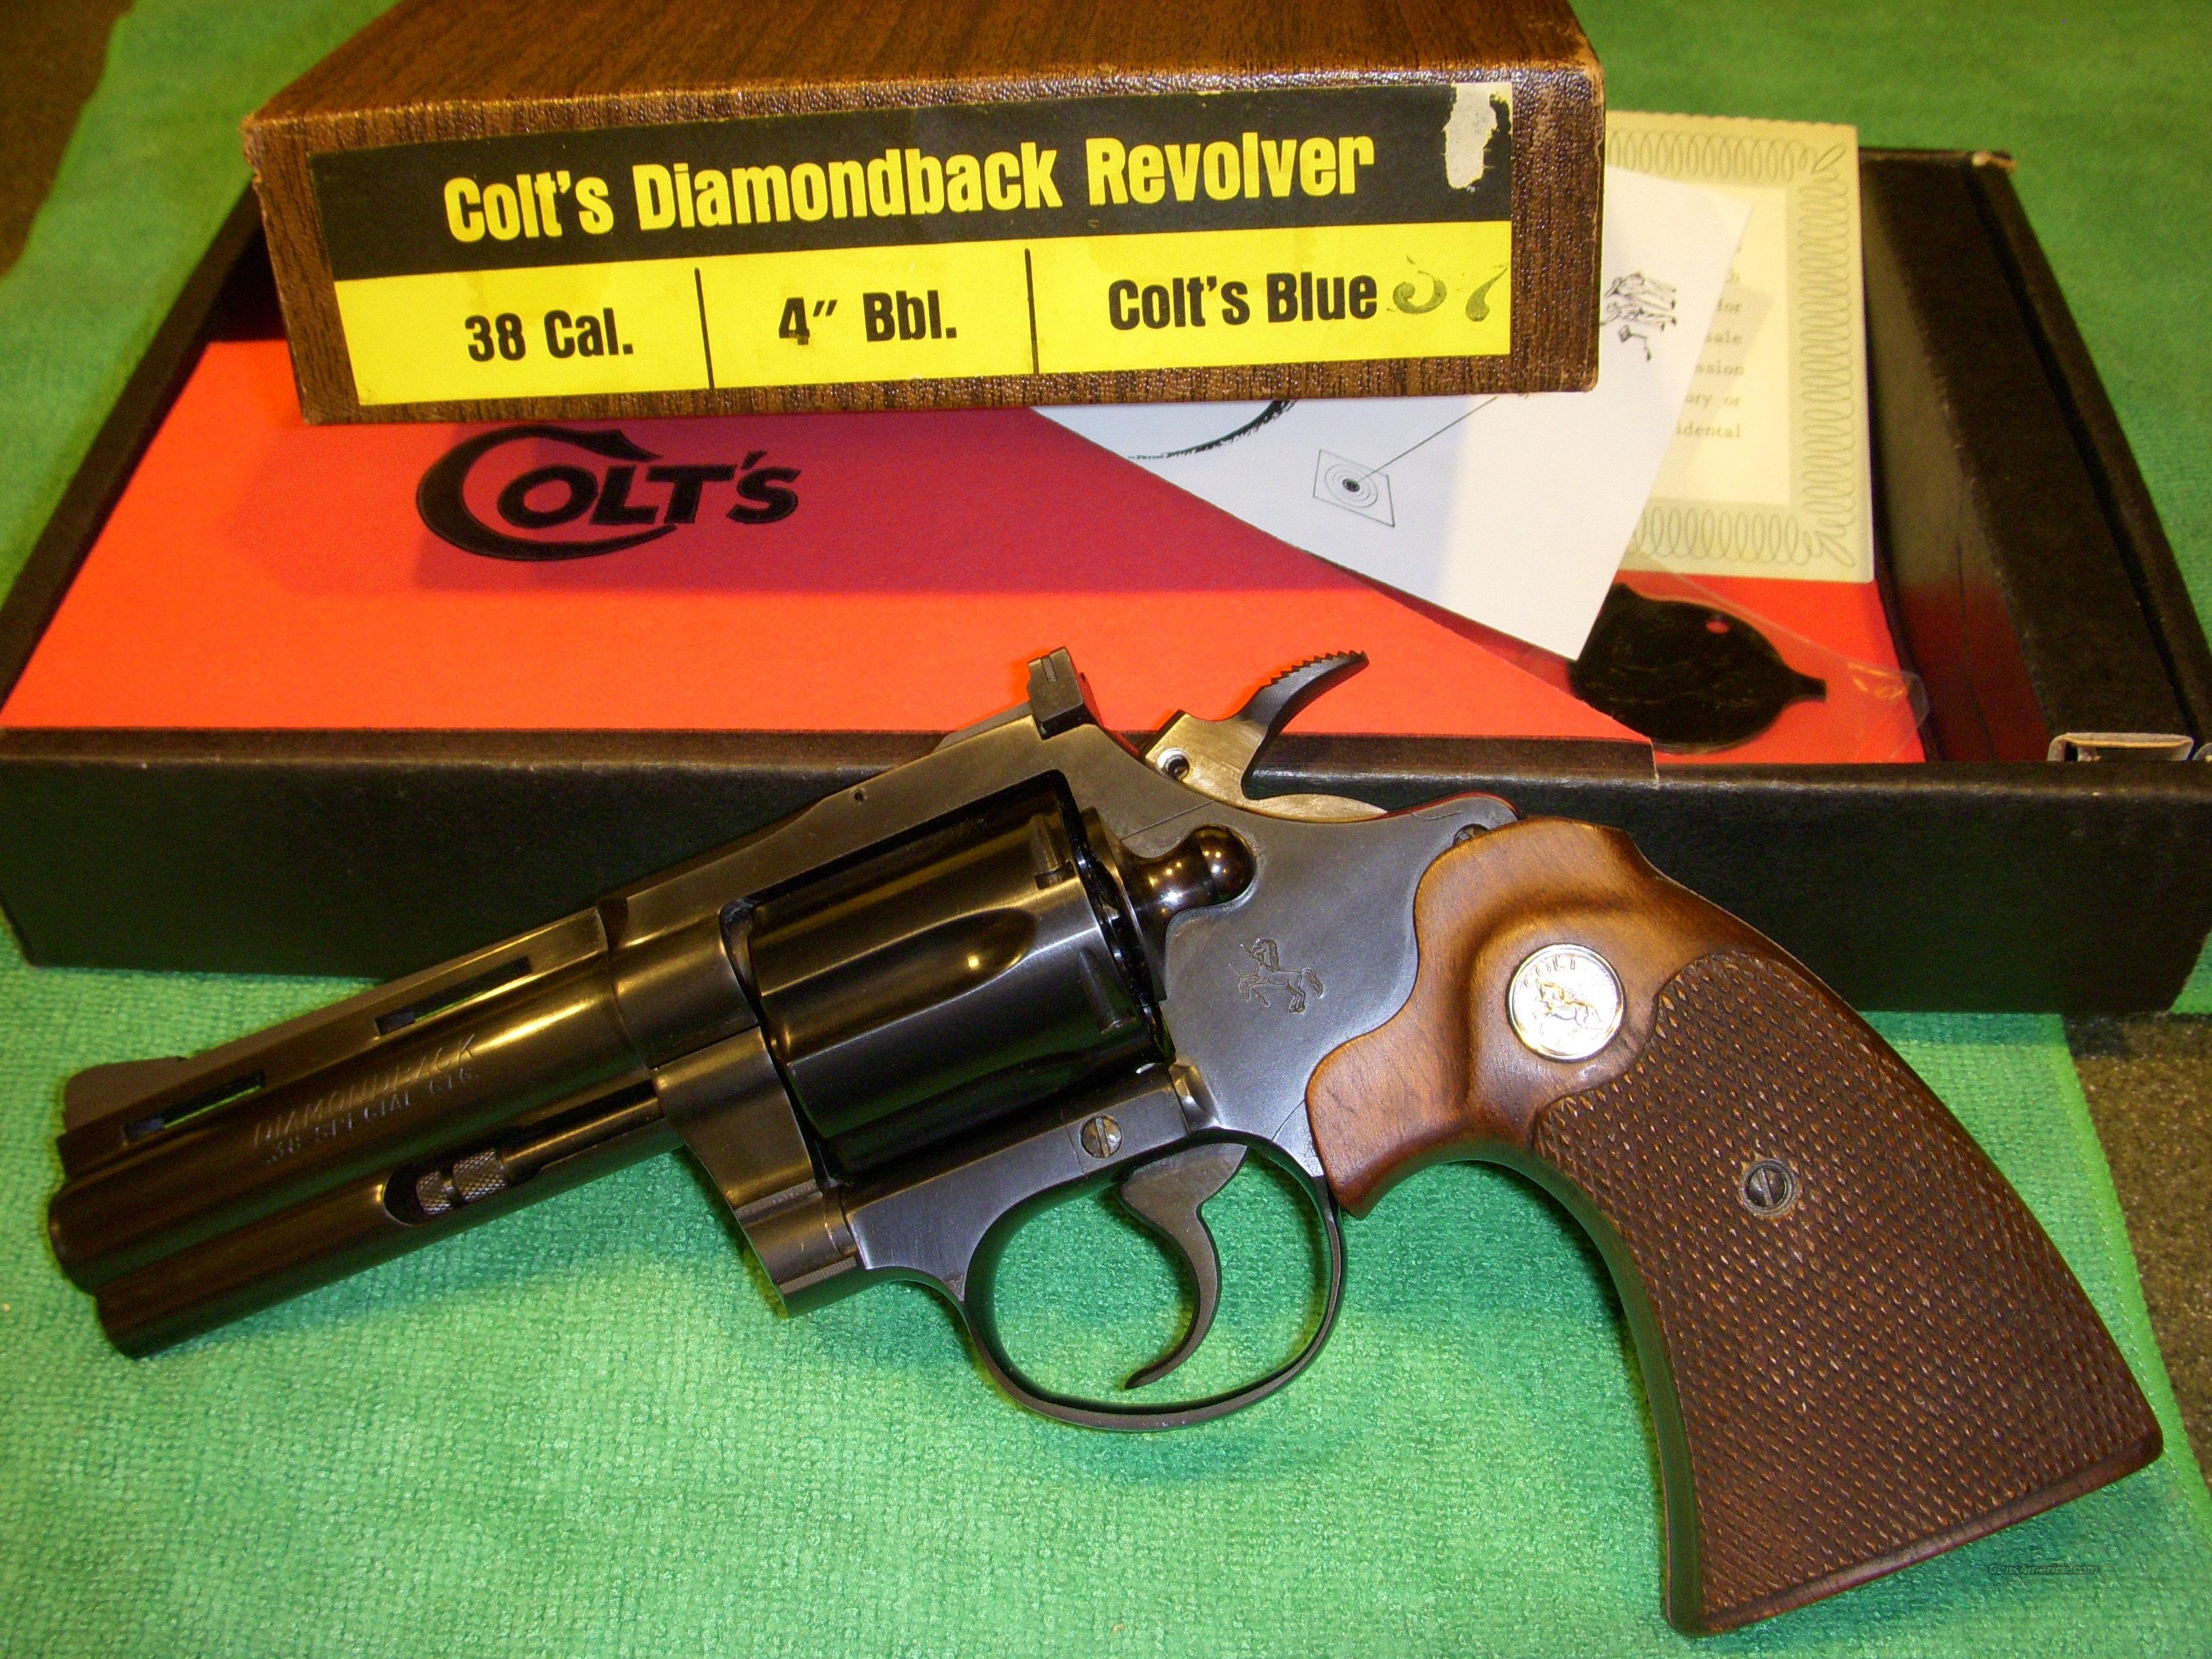 "Colt Diamondback 4"" Blue 38 Cal. Unfired/Rare  Guns > Pistols > Colt Double Action Revolvers- Modern"